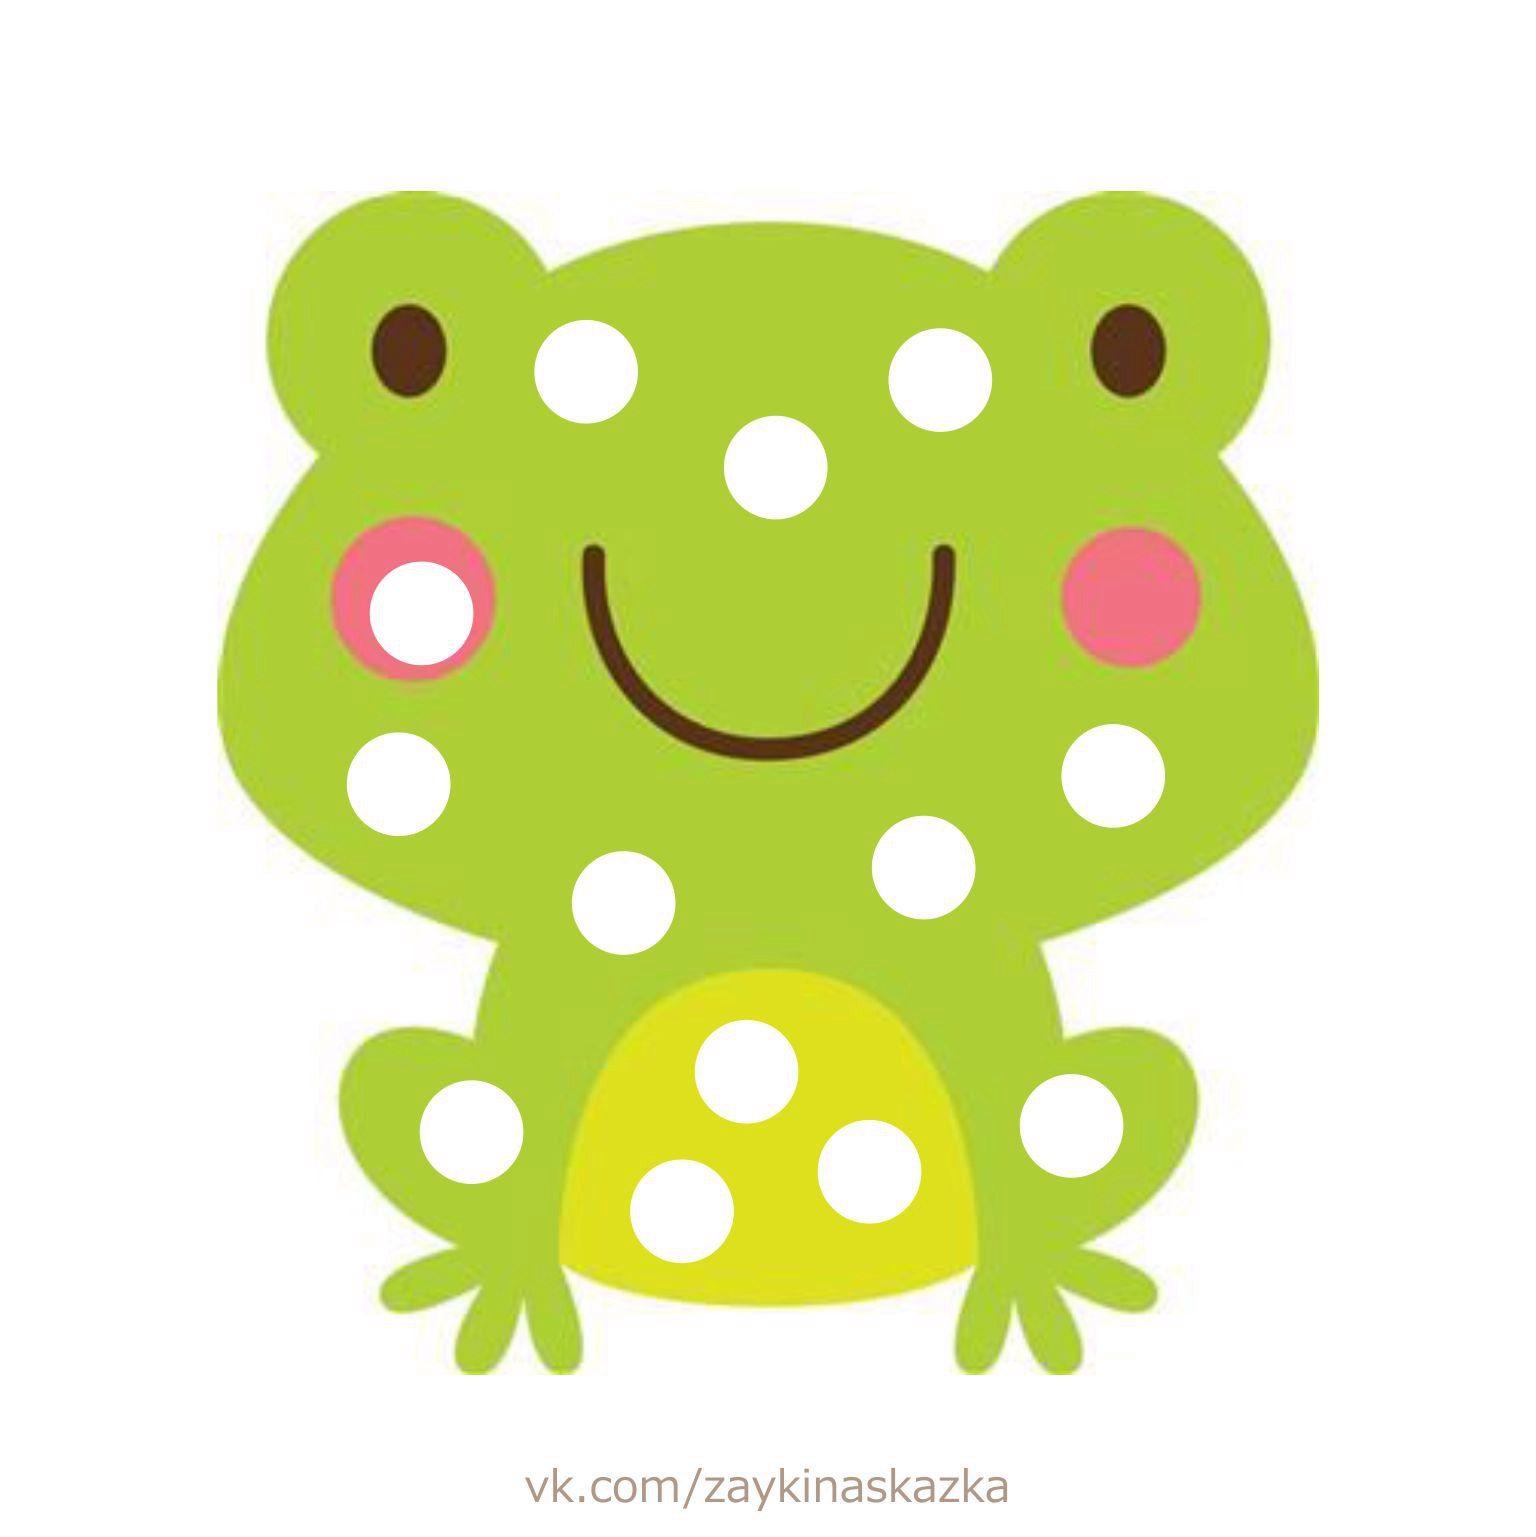 Диалоги | pompones | Pinterest | Montessori, Matching games and ...